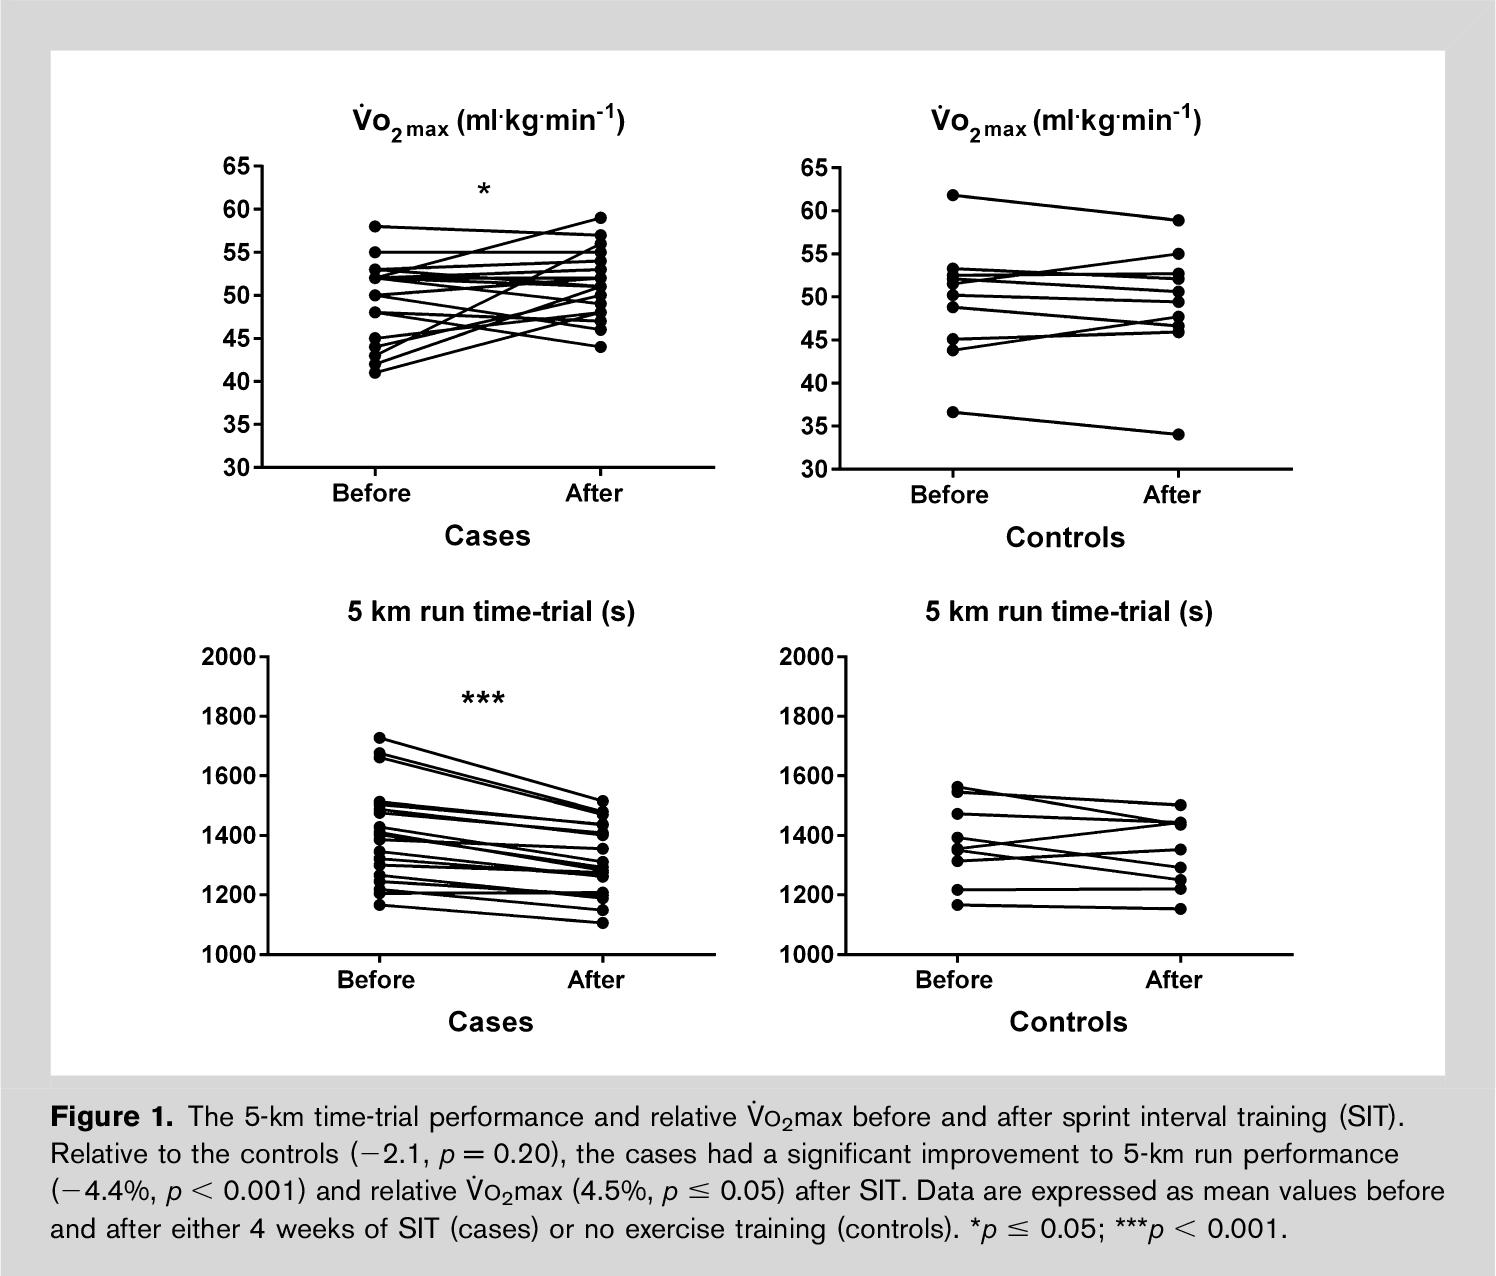 VO2max + 5km time trial run performance